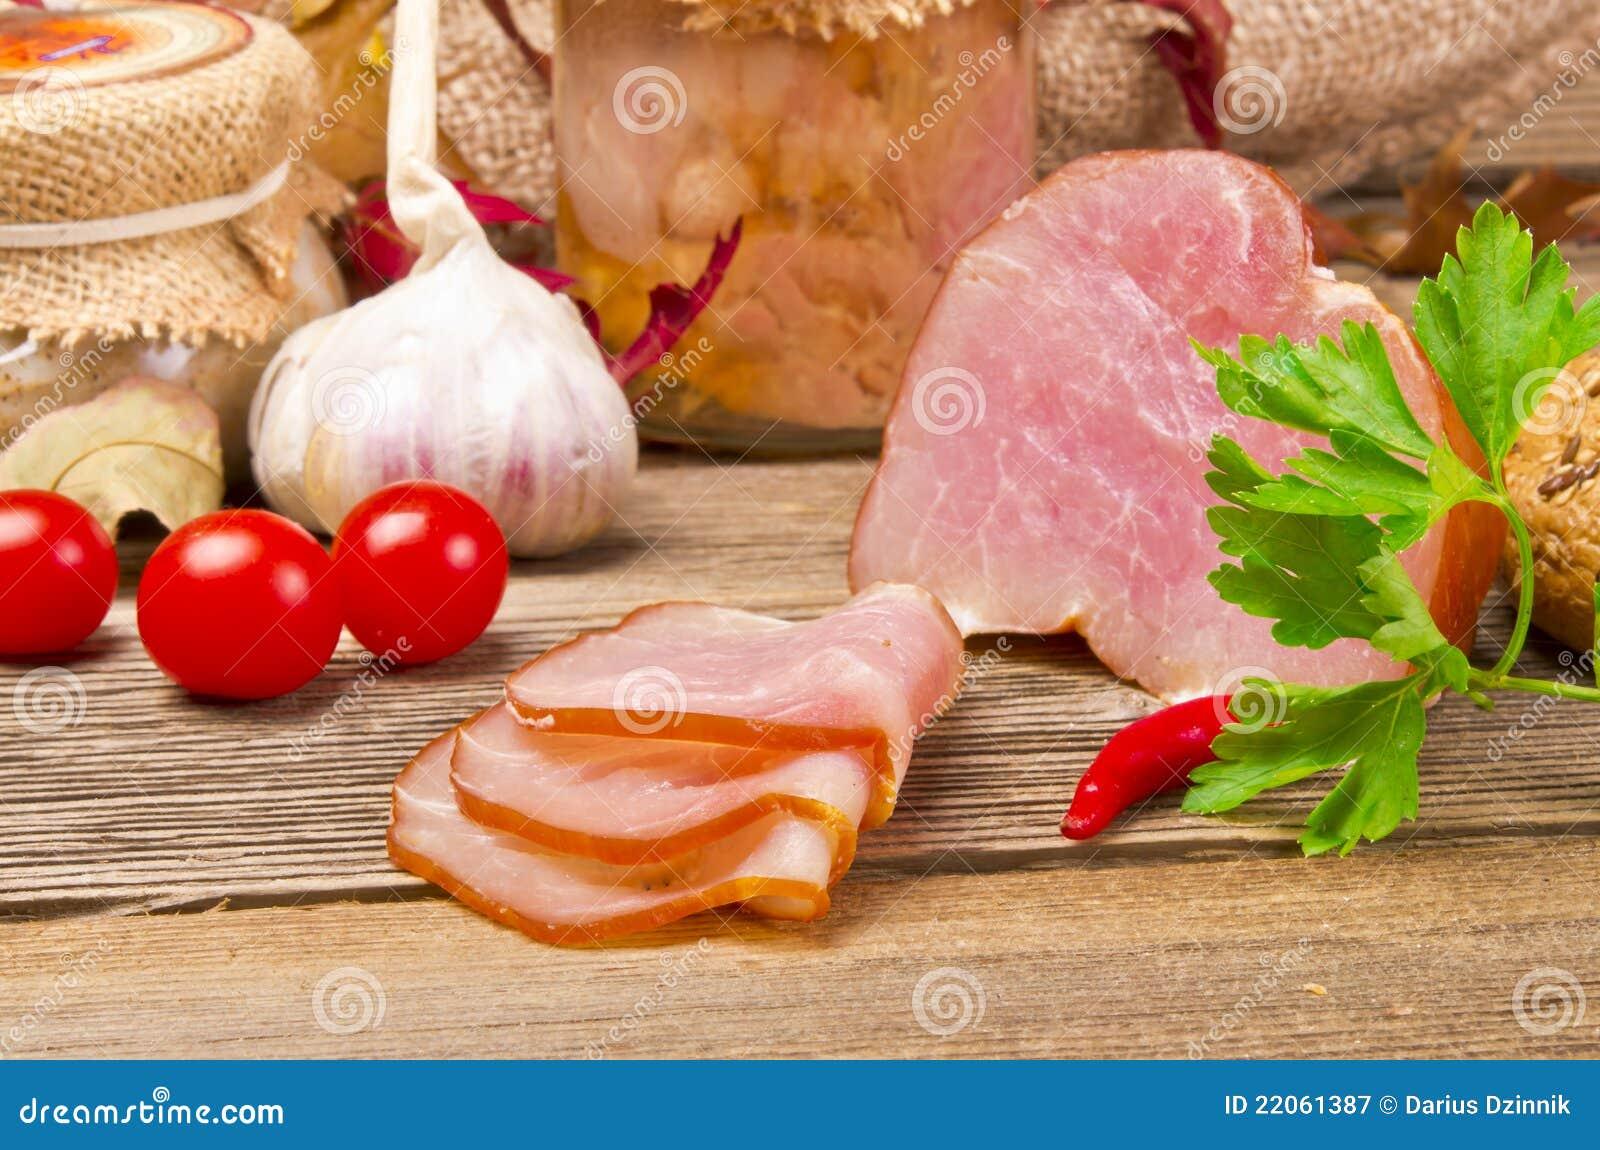 how to cook ham fillet